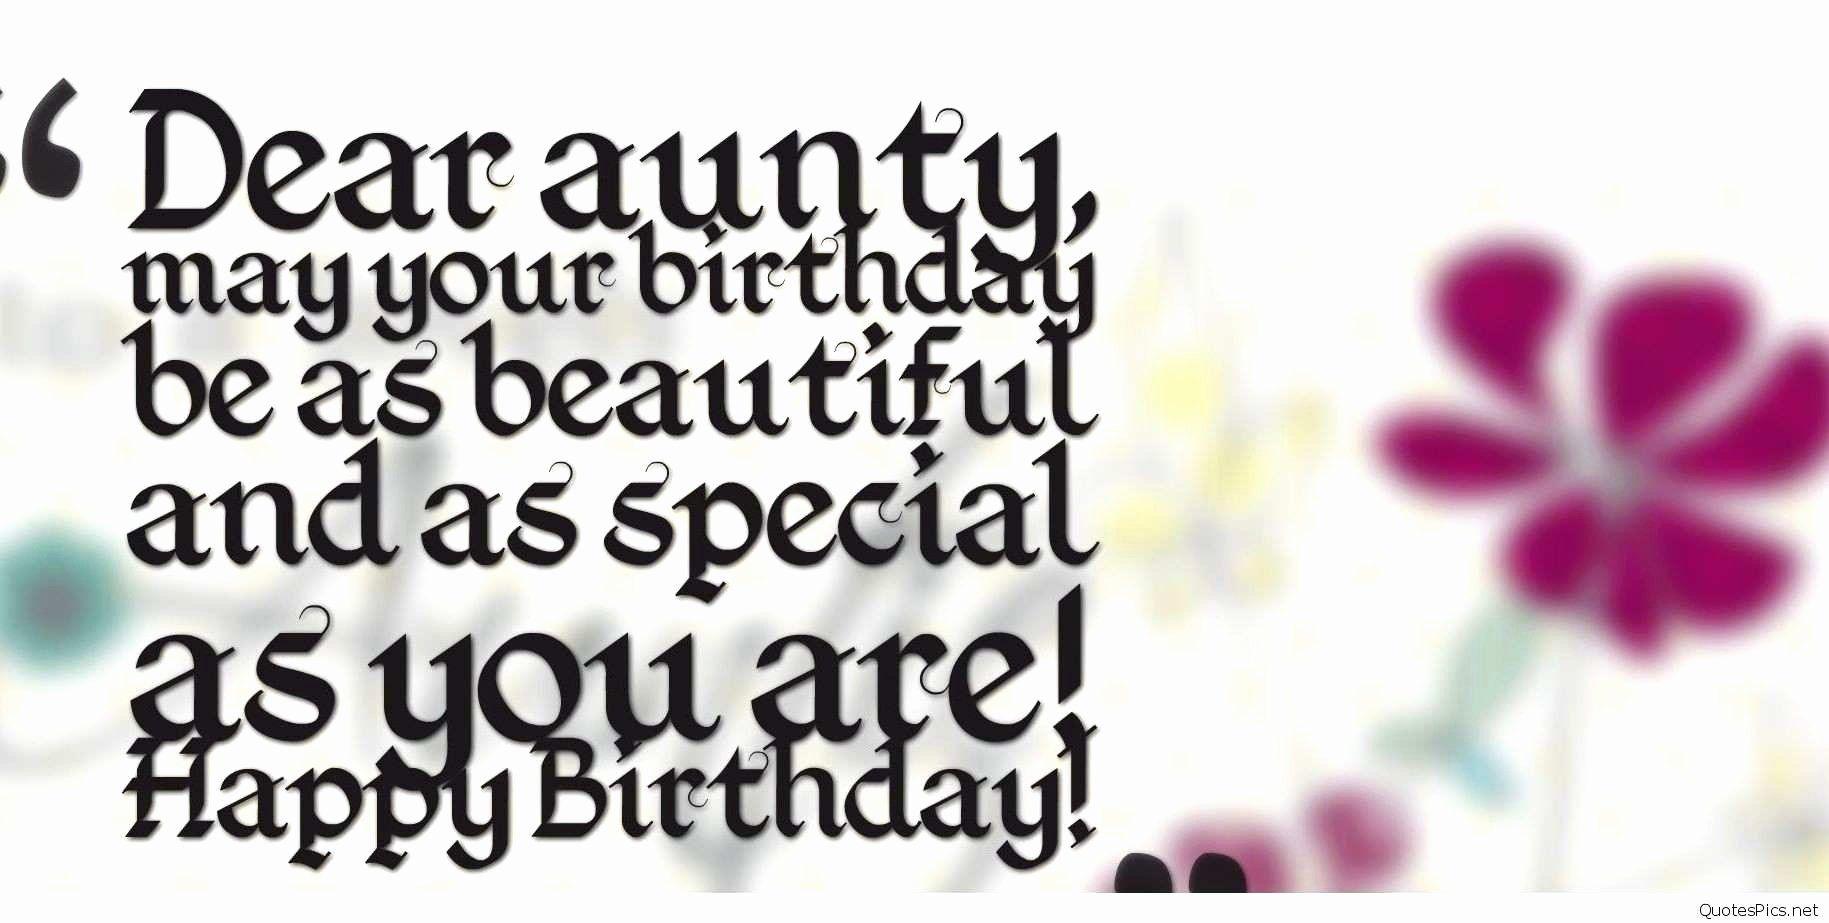 Awesome Aunt Birthday Meme